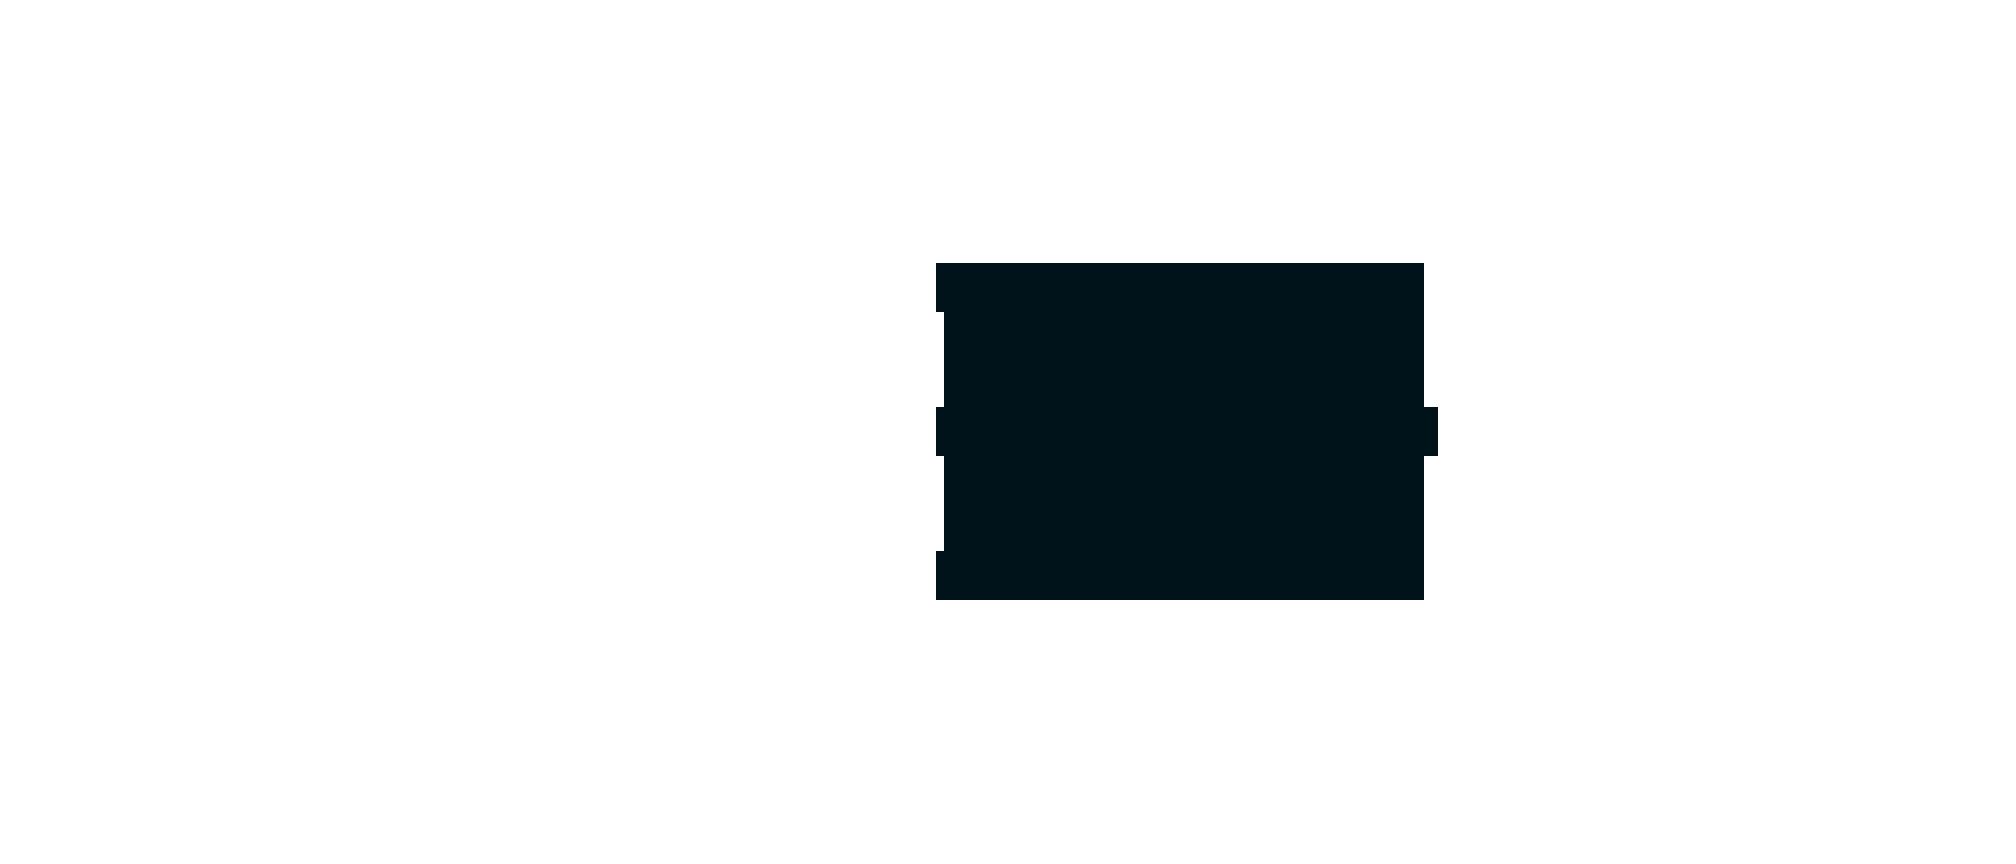 Symbolset ss gizmo symbolset biocorpaavc